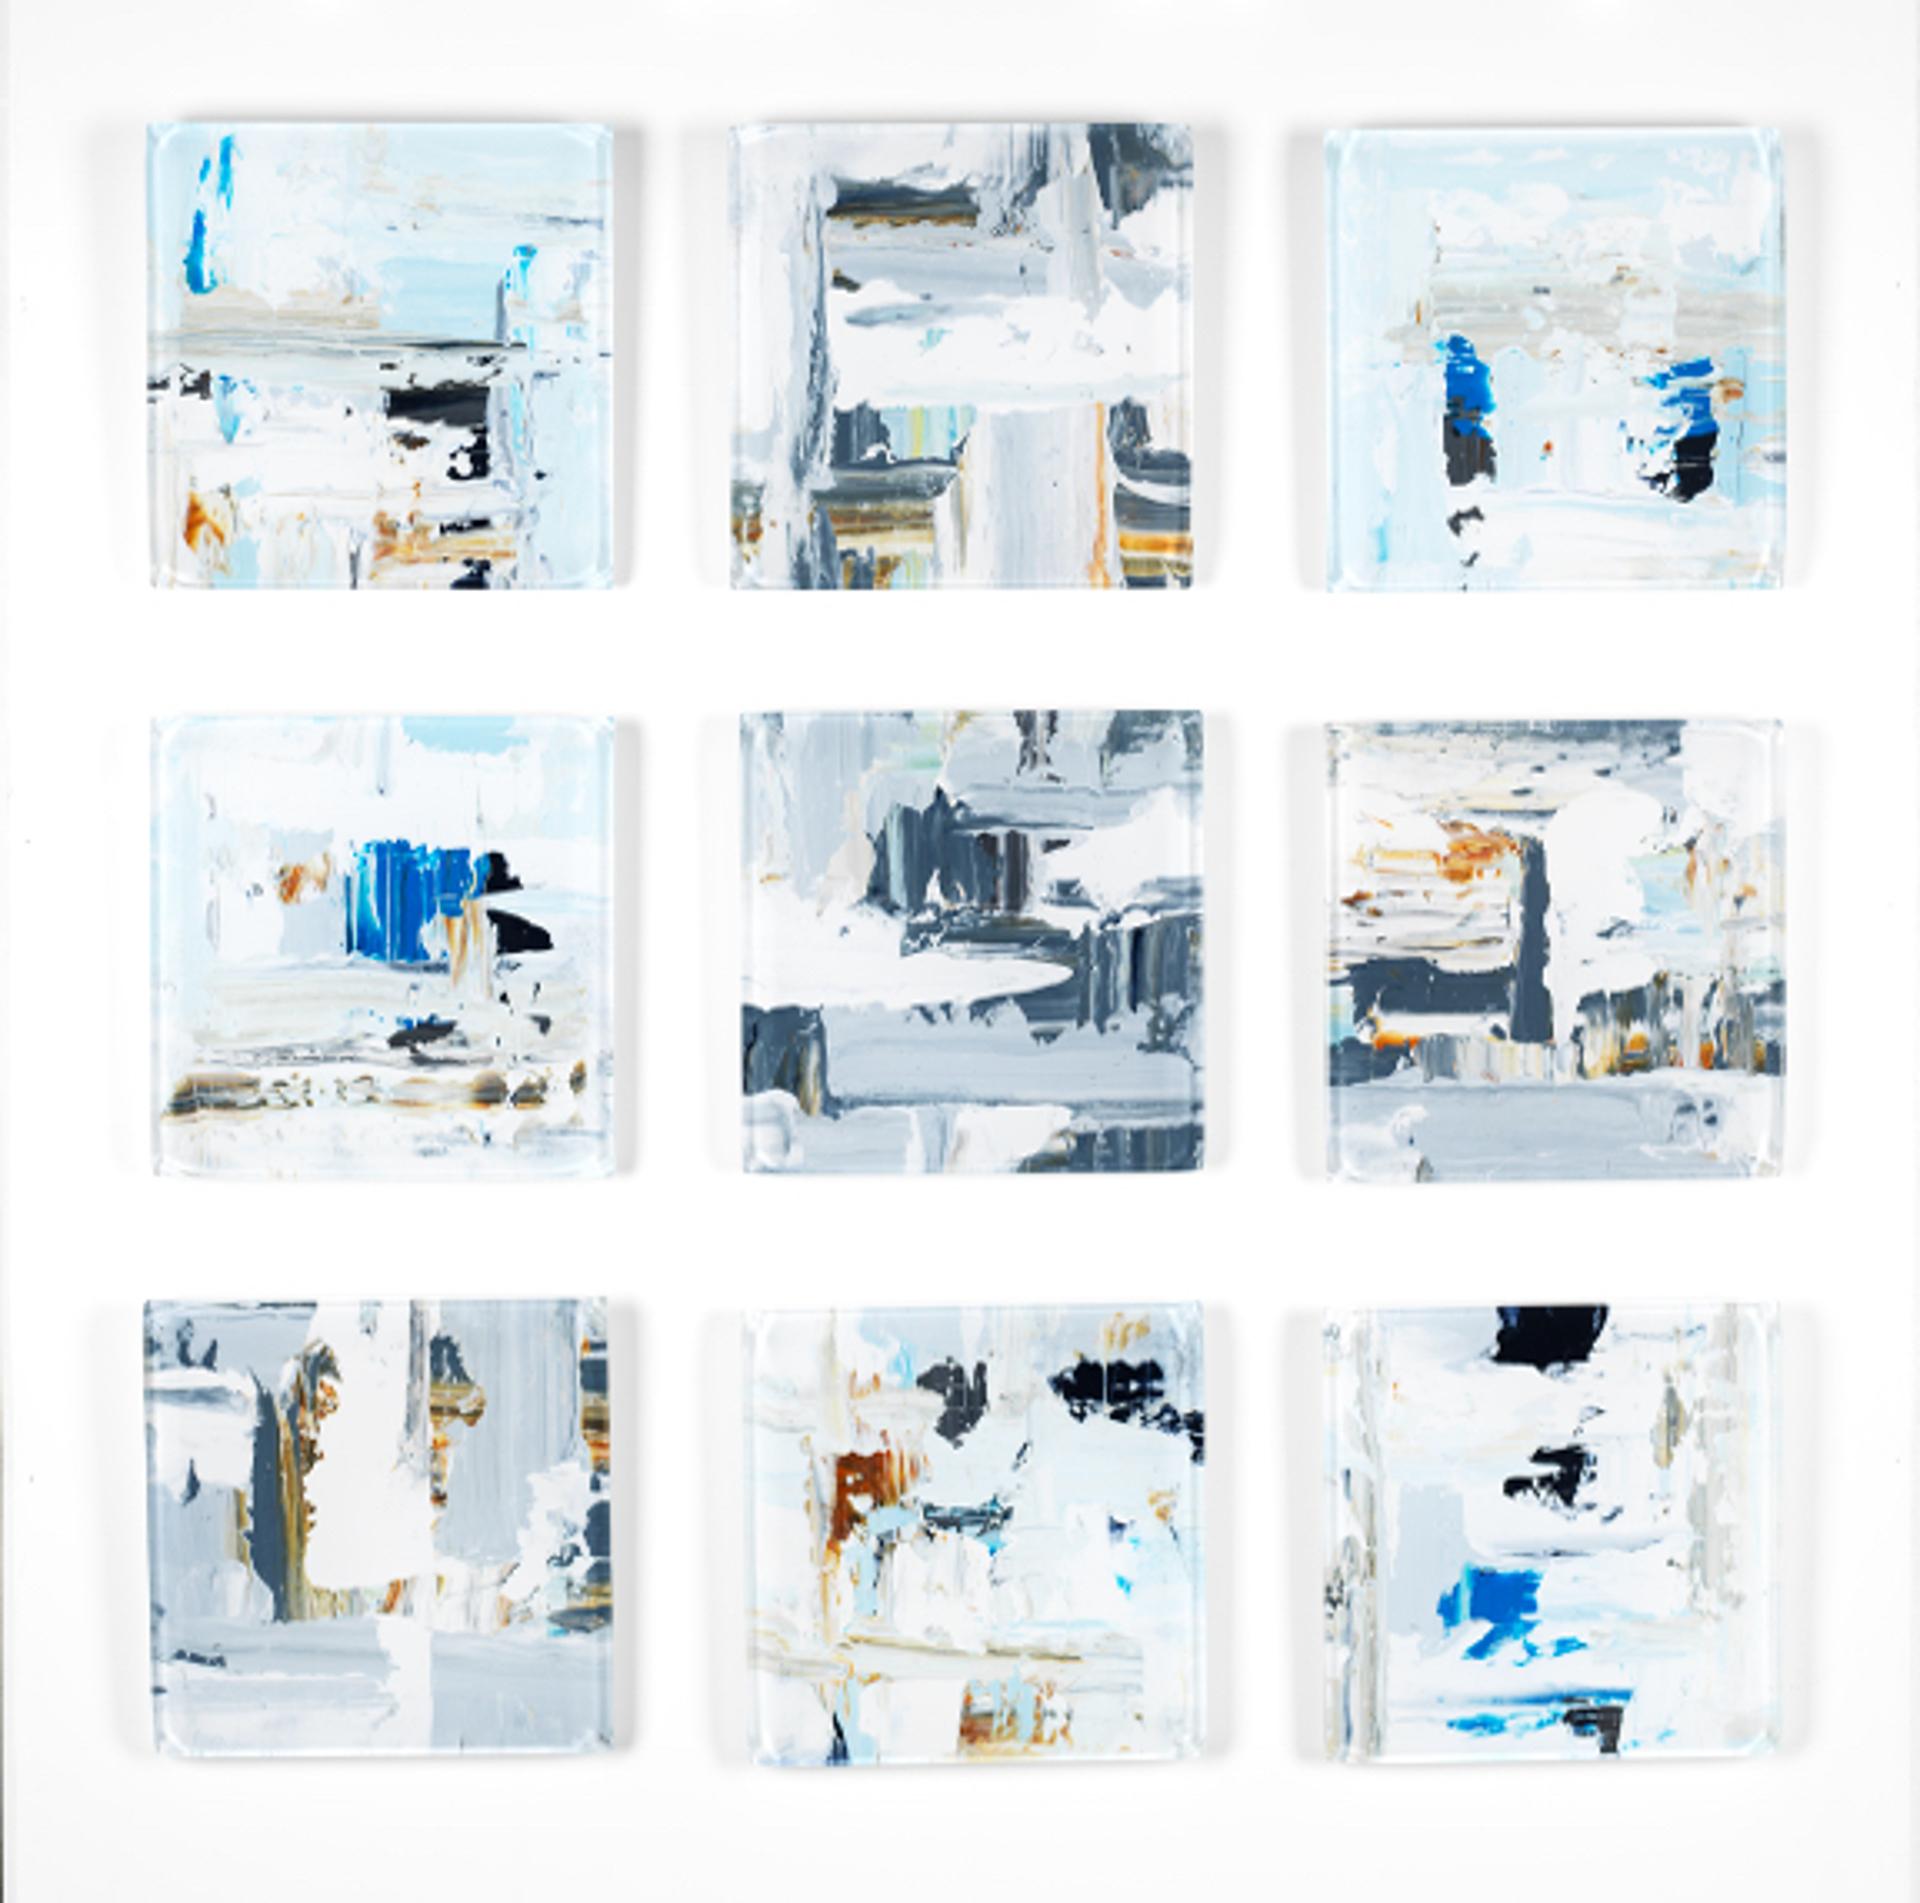 Vetro 0618-02 (9 Panel Set) by John Schuyler